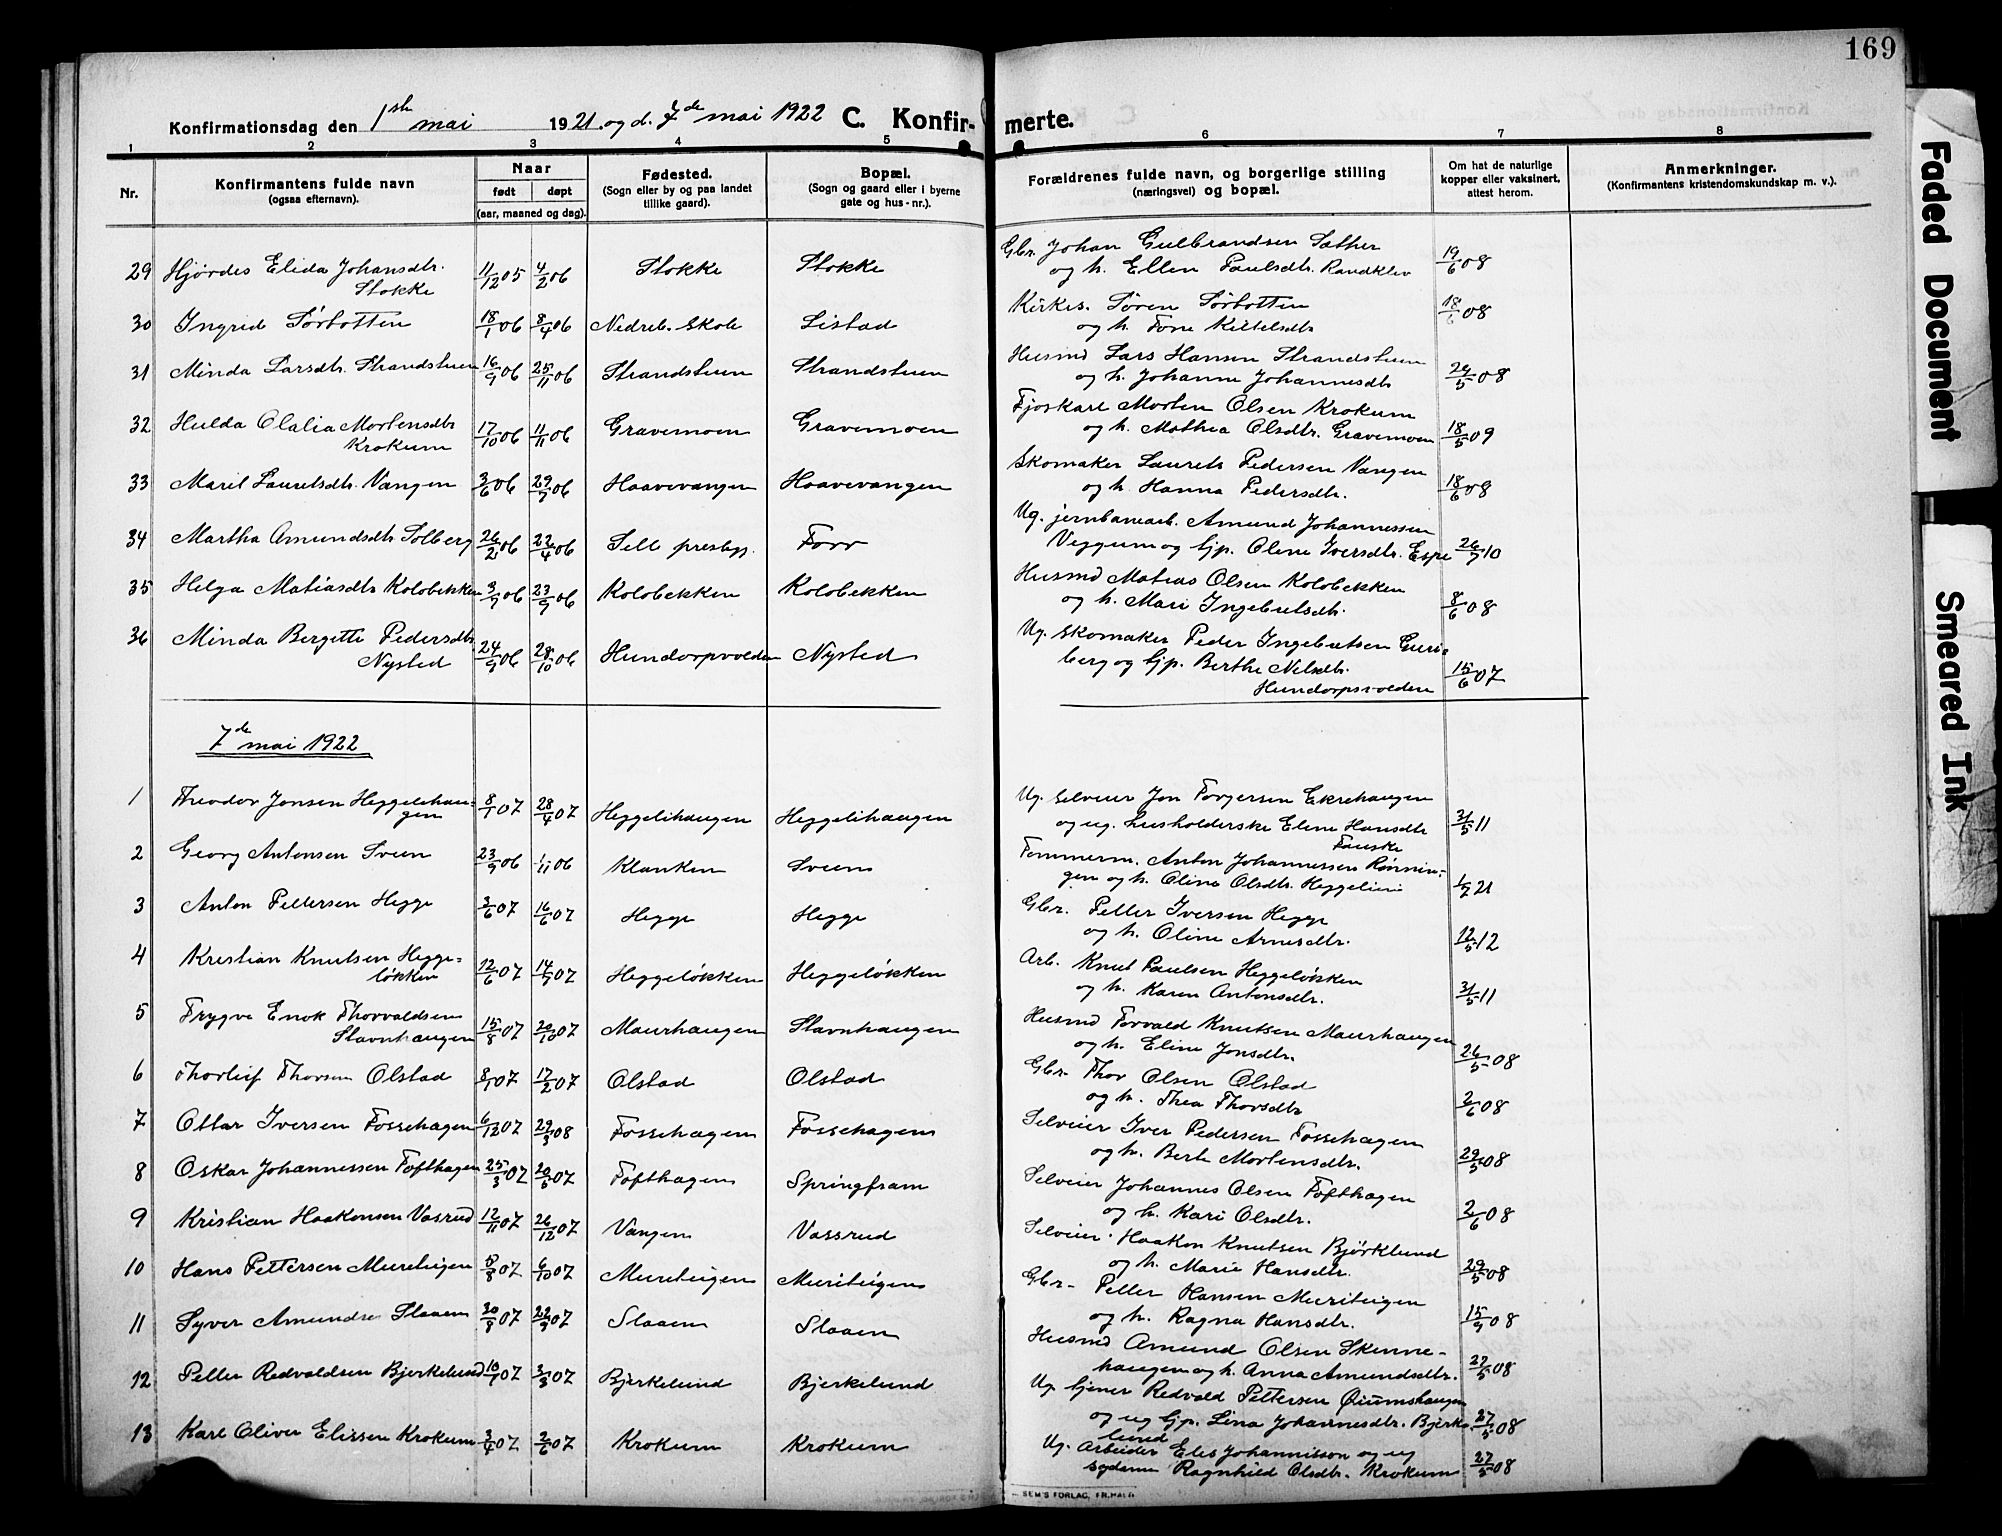 SAH, Sør-Fron prestekontor, H/Ha/Hab/L0005: Klokkerbok nr. 5, 1912-1930, s. 169